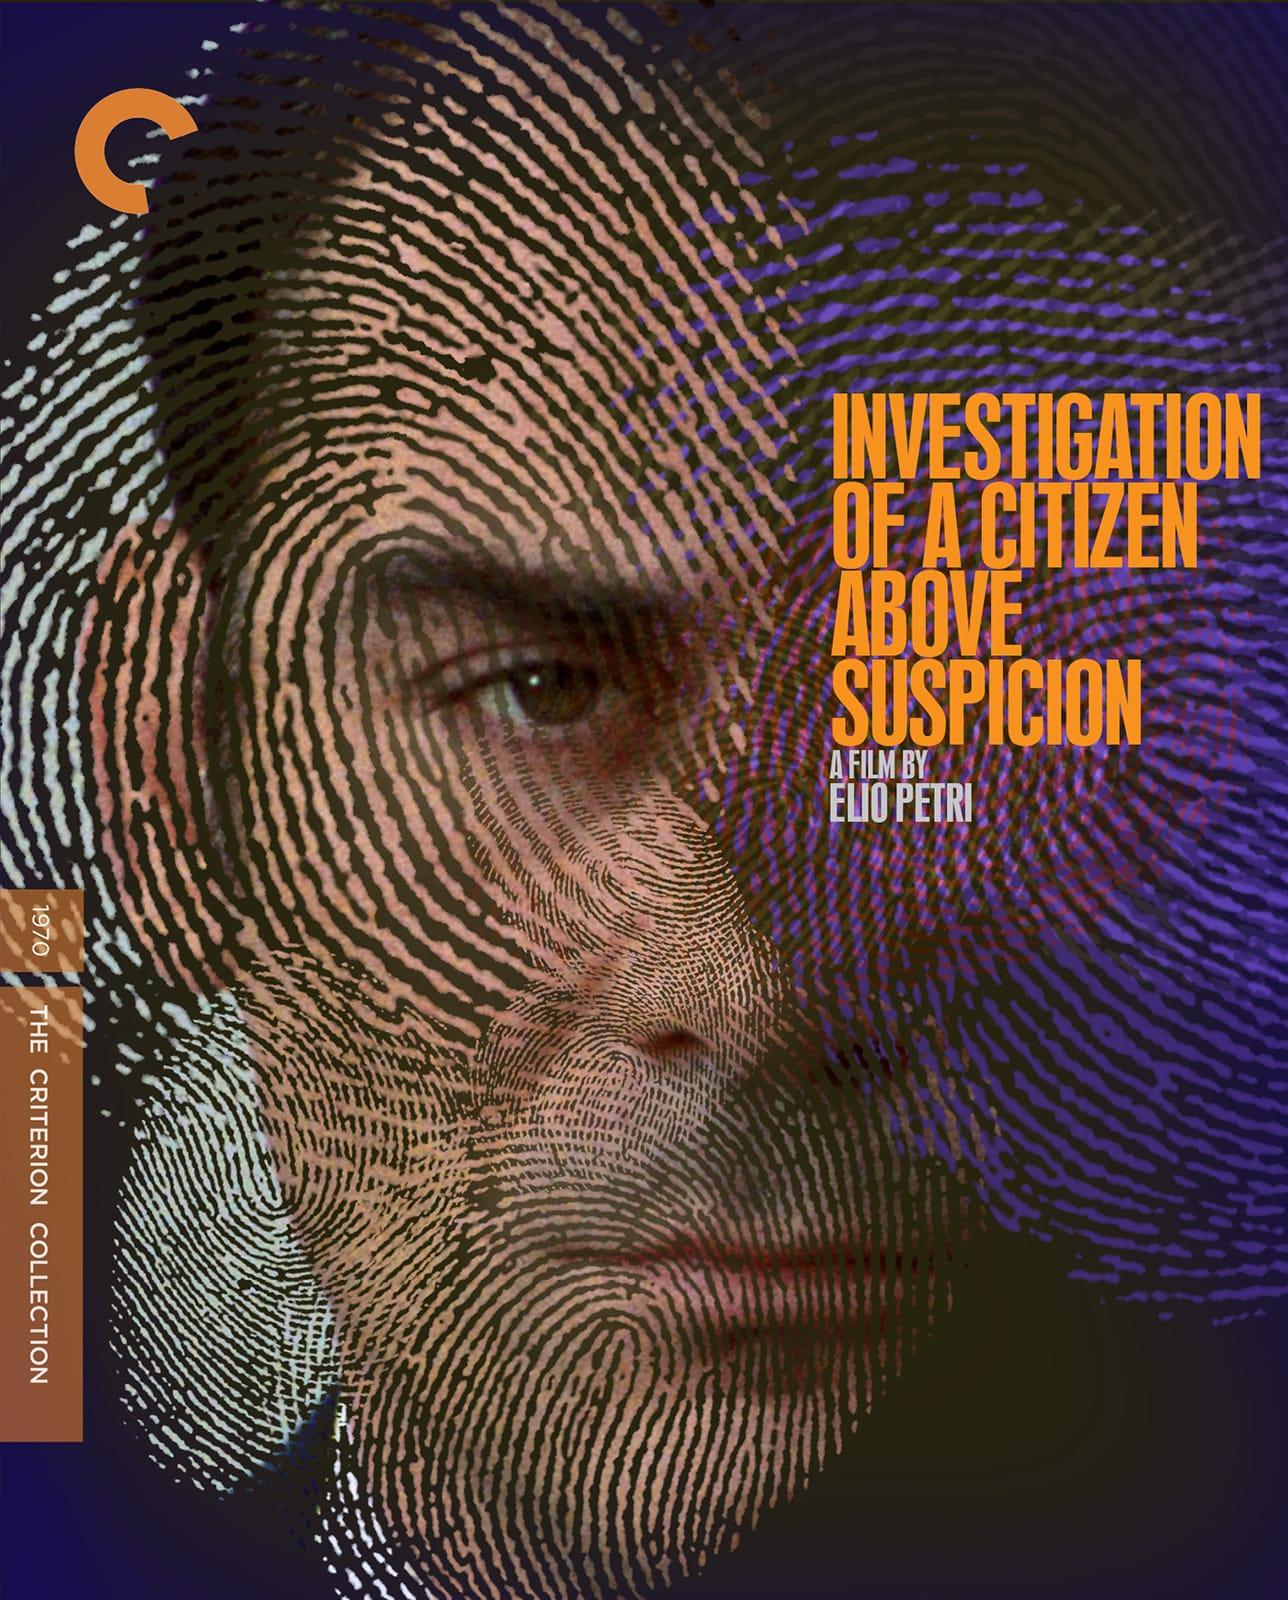 investigation of a citizen above suspicion watch online free